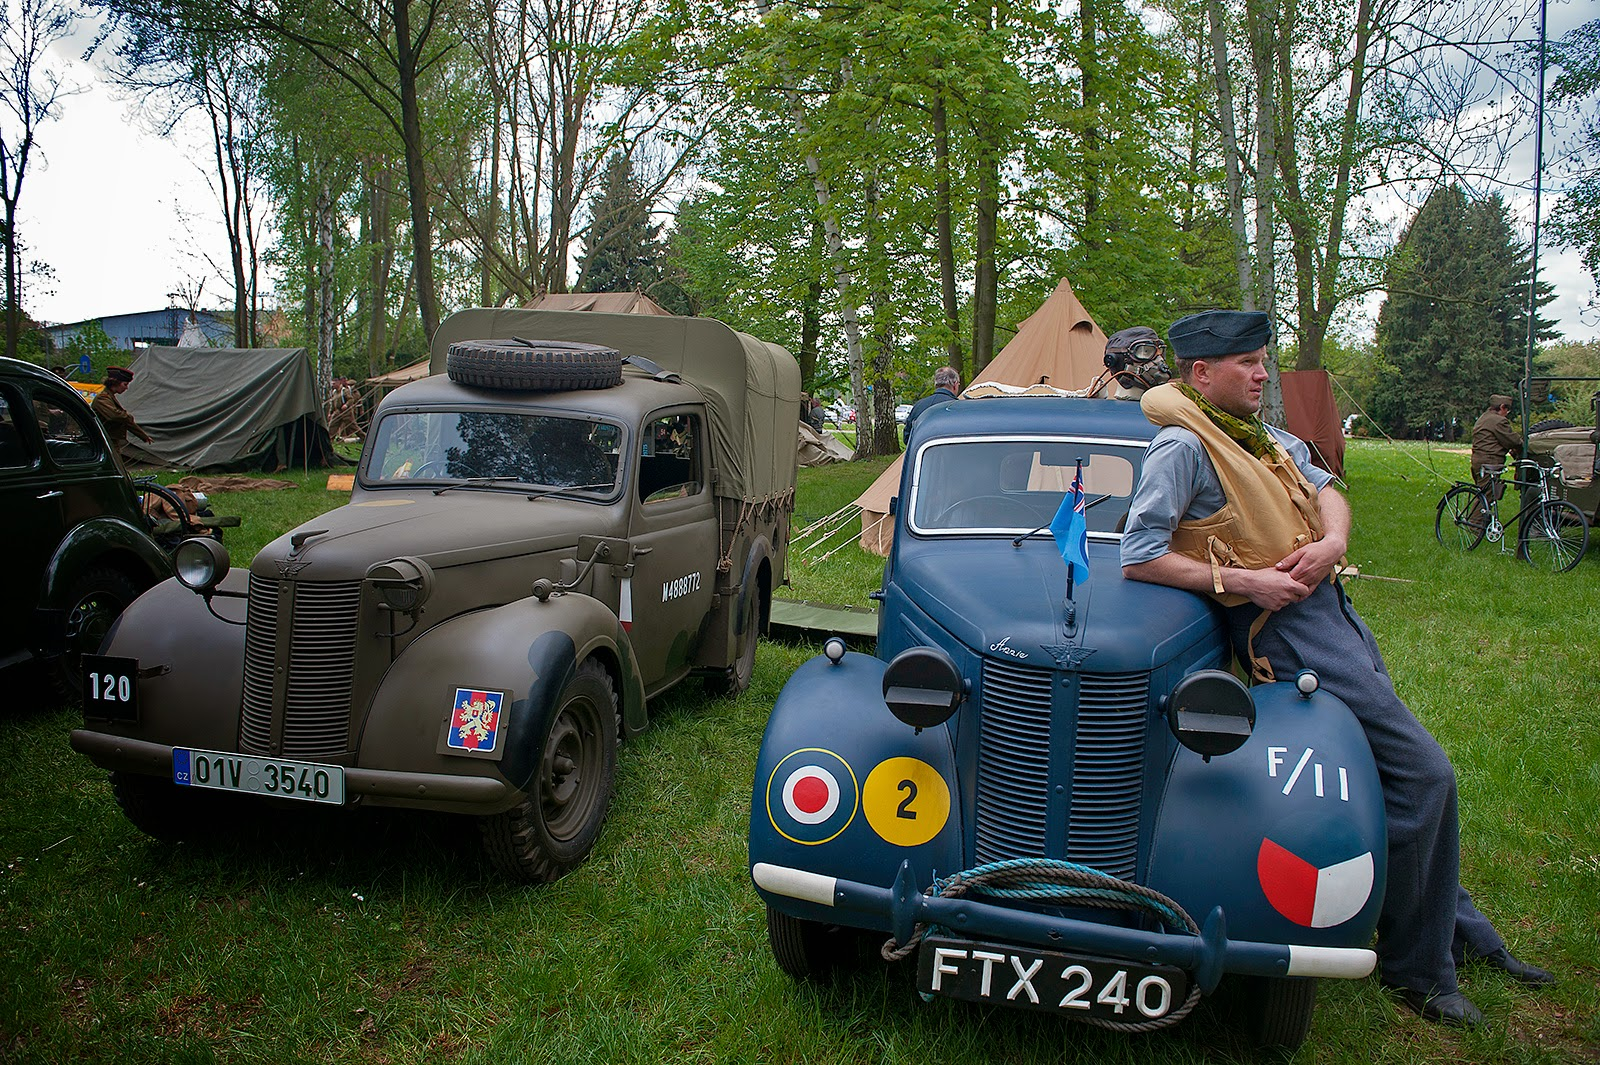 WWII, Plzen, World War II, U.S. WWII soldiers, 16 Armored Division, Liberation of Plzen, Czech Republic, Czechoslovakia, Czech soldiers, Czechoslovak soldiers, Czechoslovak army